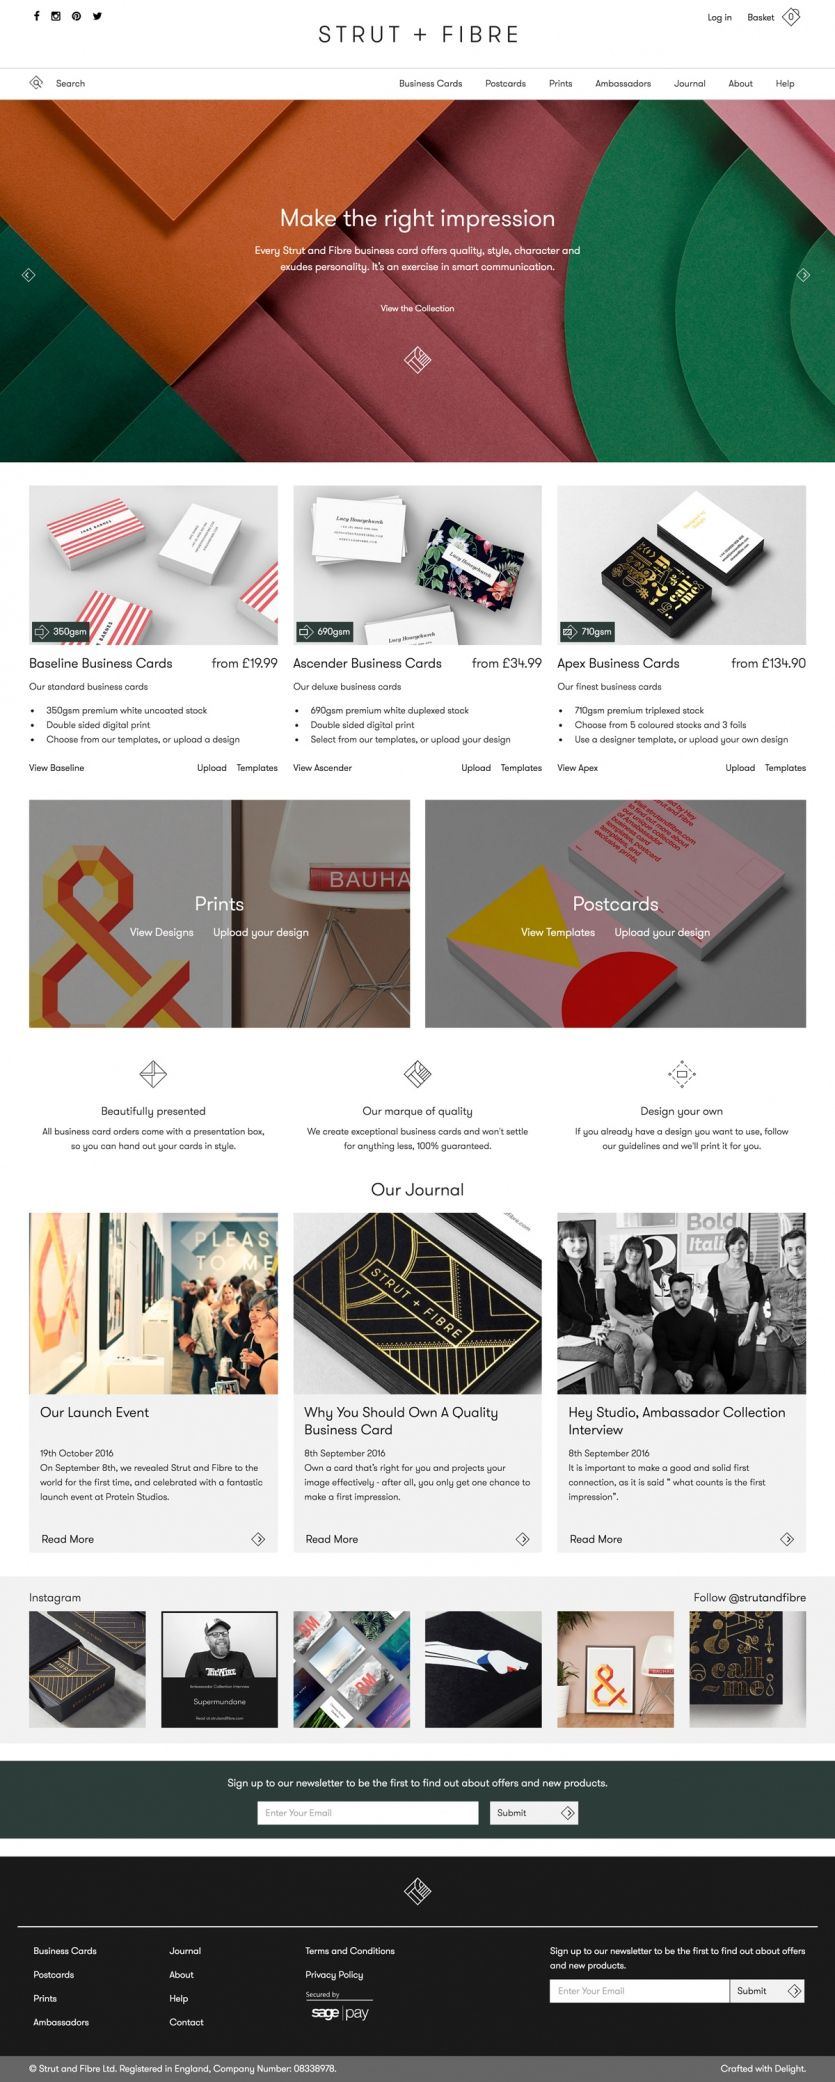 strut and fibre website pinterest web design web design rh pinterest com